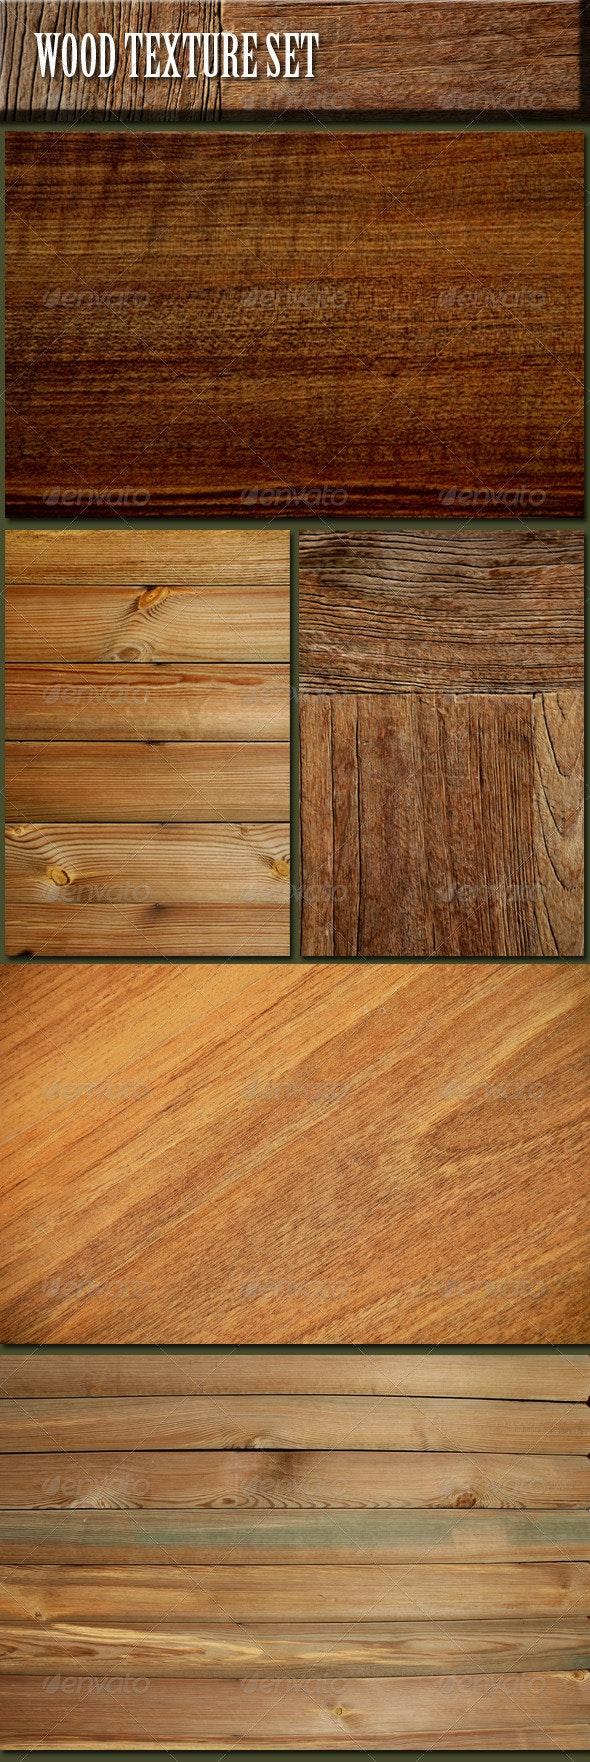 Wood Texture Set - Wood Textures